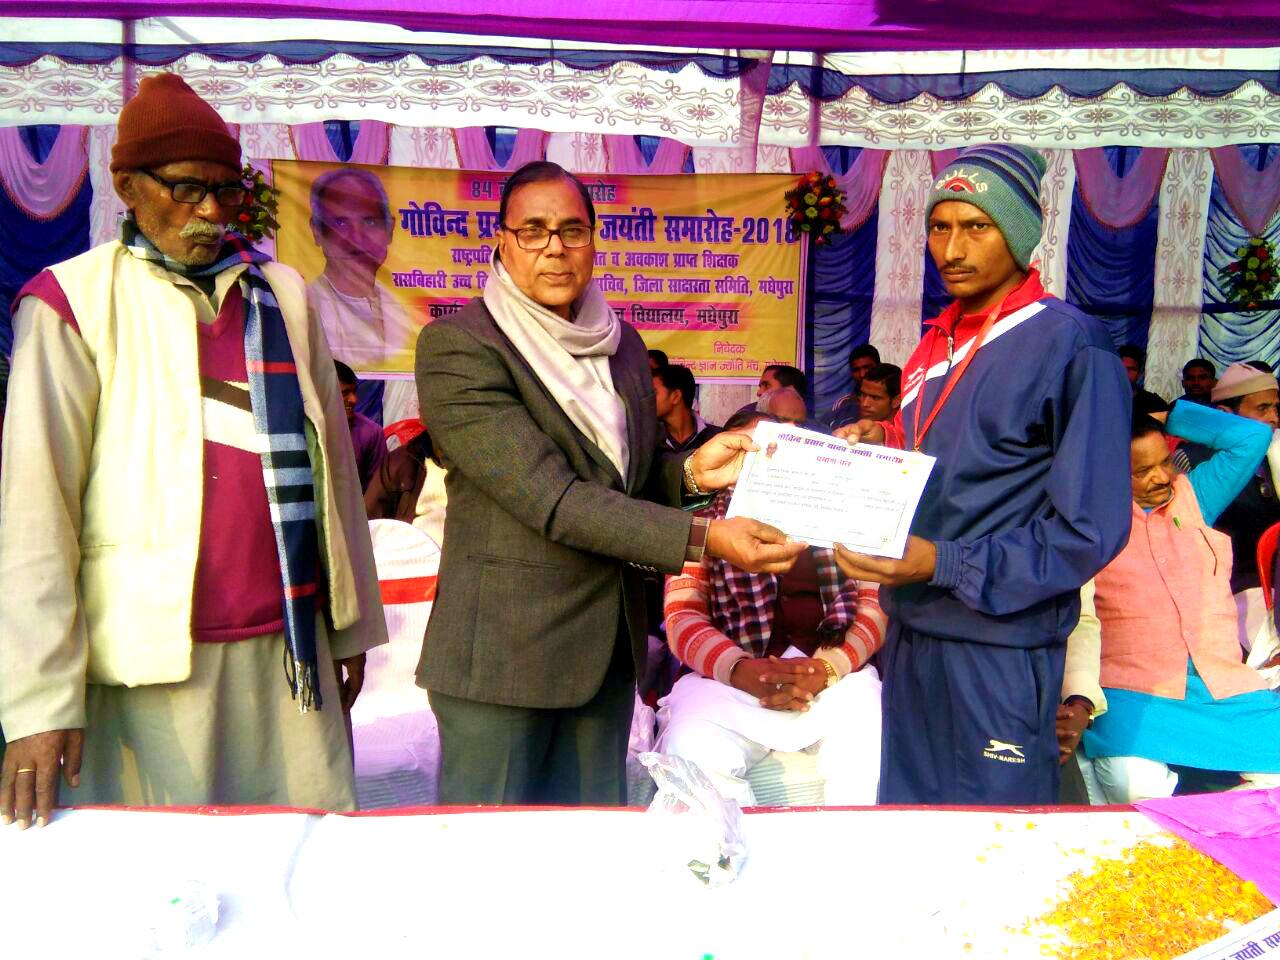 Samajsevi Dr.Bhupendra Narayan Madhepuri along with Ex.MLA Permeshwari Prasad Nirala giving medal & certificate to Mairathan Dhawak, on the occasion of 84th Jayanti of a popular teacher Govind Prasad Yadav of Rasbihari High School, organised by Govind Gyan Jyoti Manch, Madhepura.